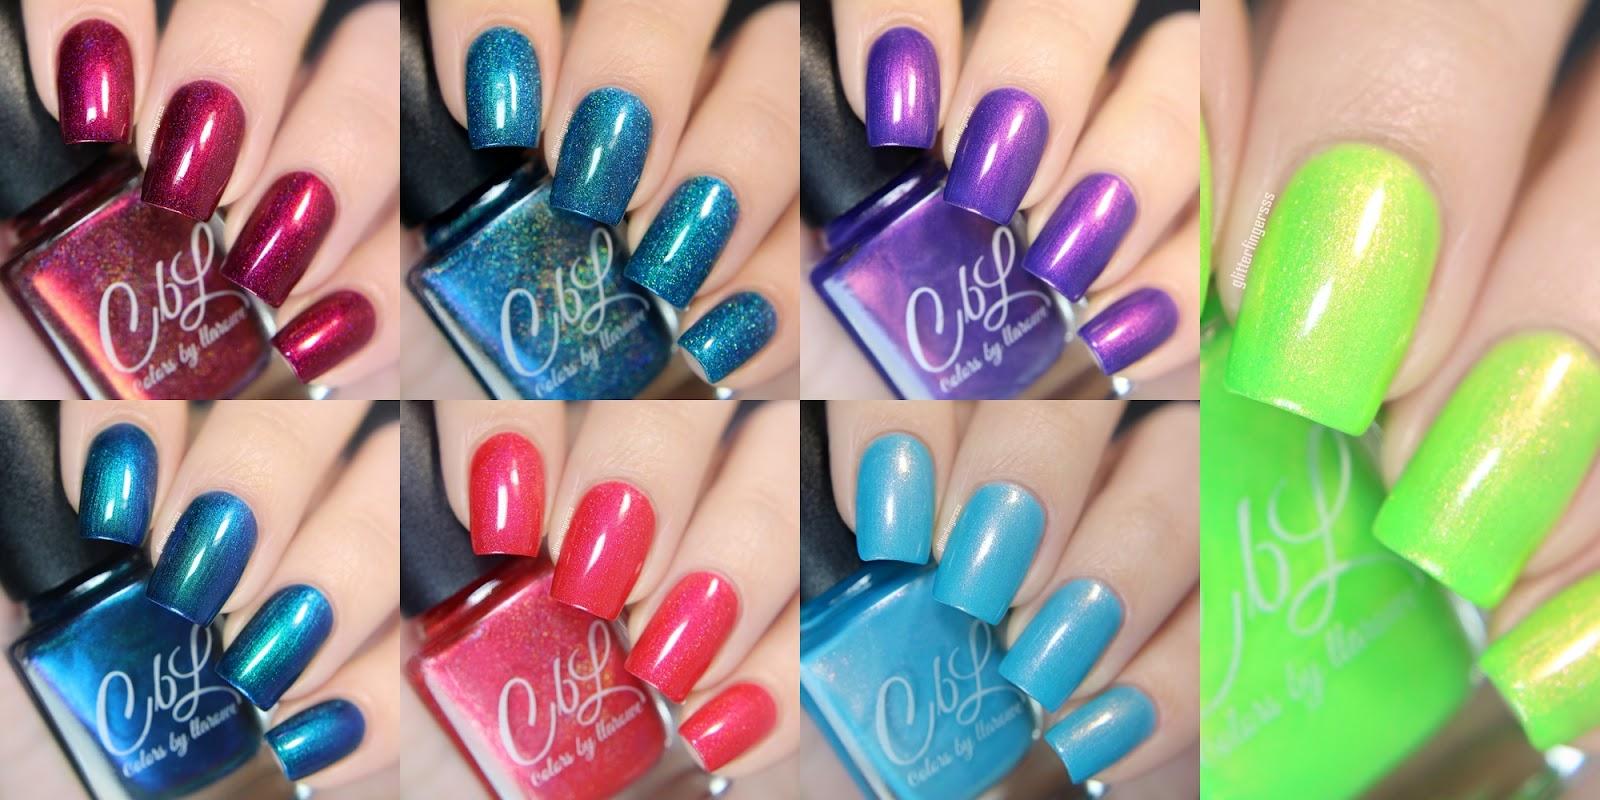 Colors By Llarowe Spring Summer 2017 Glitterfingersss